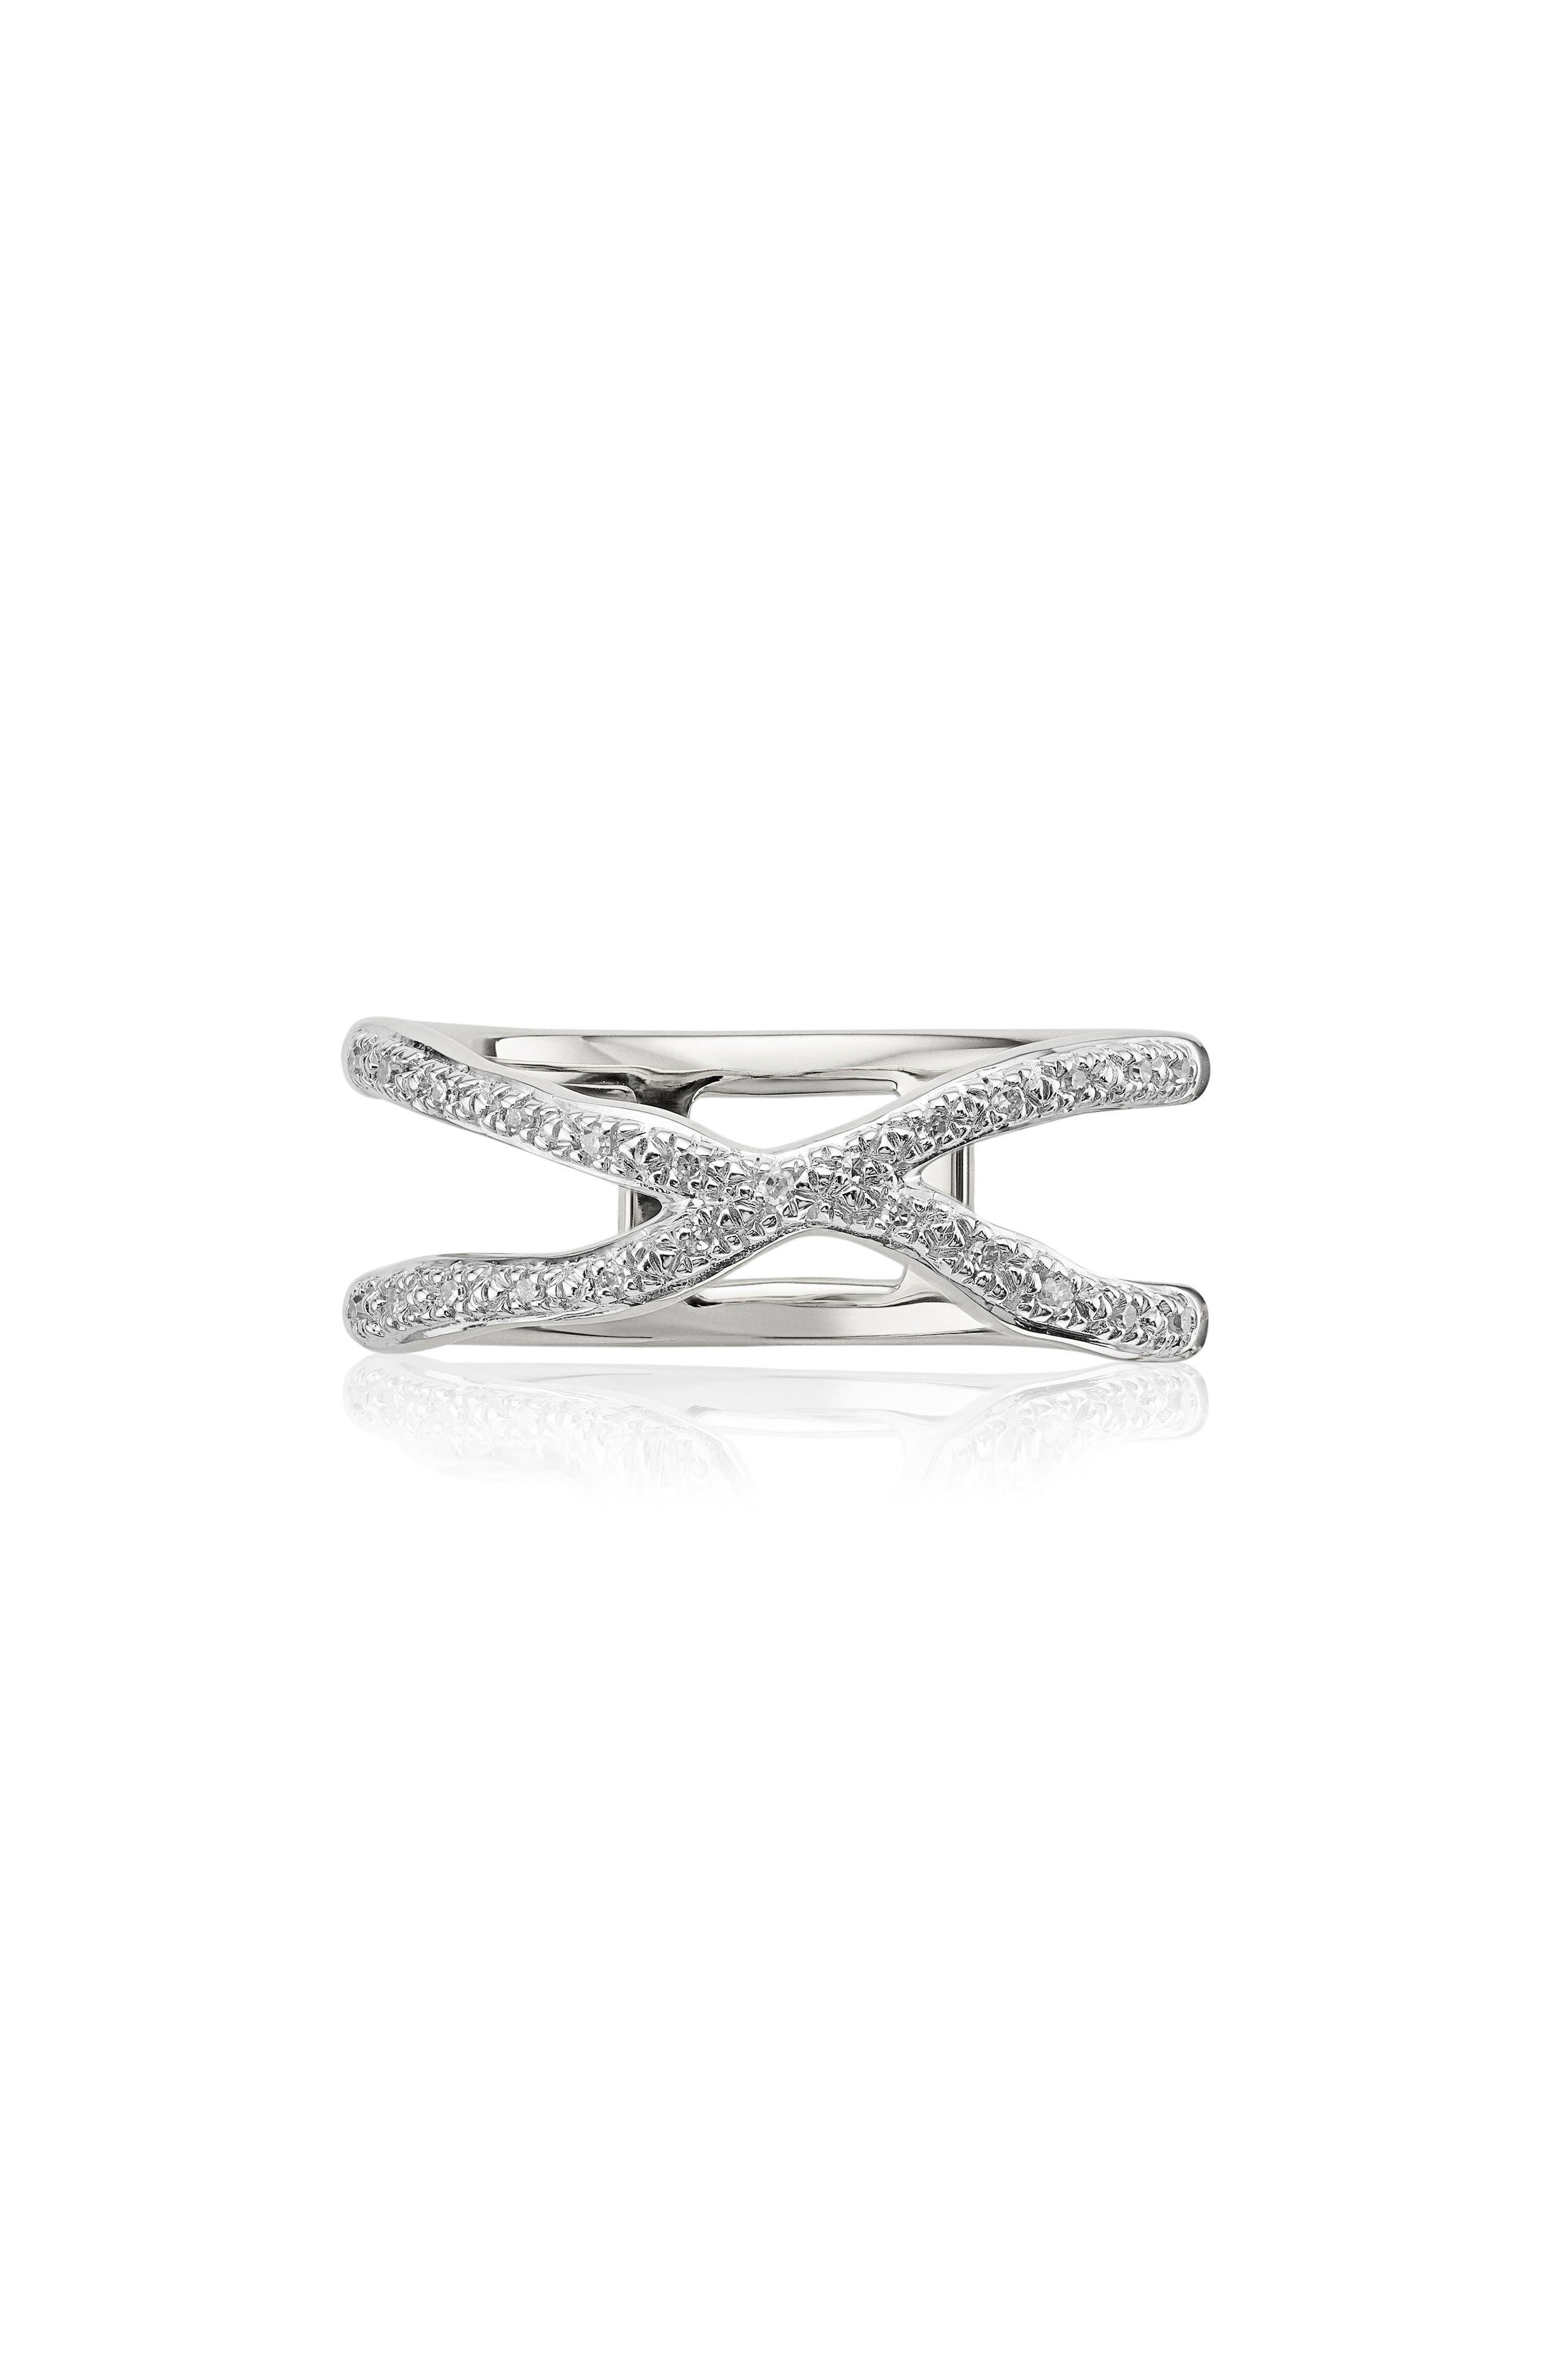 Riva Diamond Ring,                             Main thumbnail 1, color,                             Silver/ Diamond